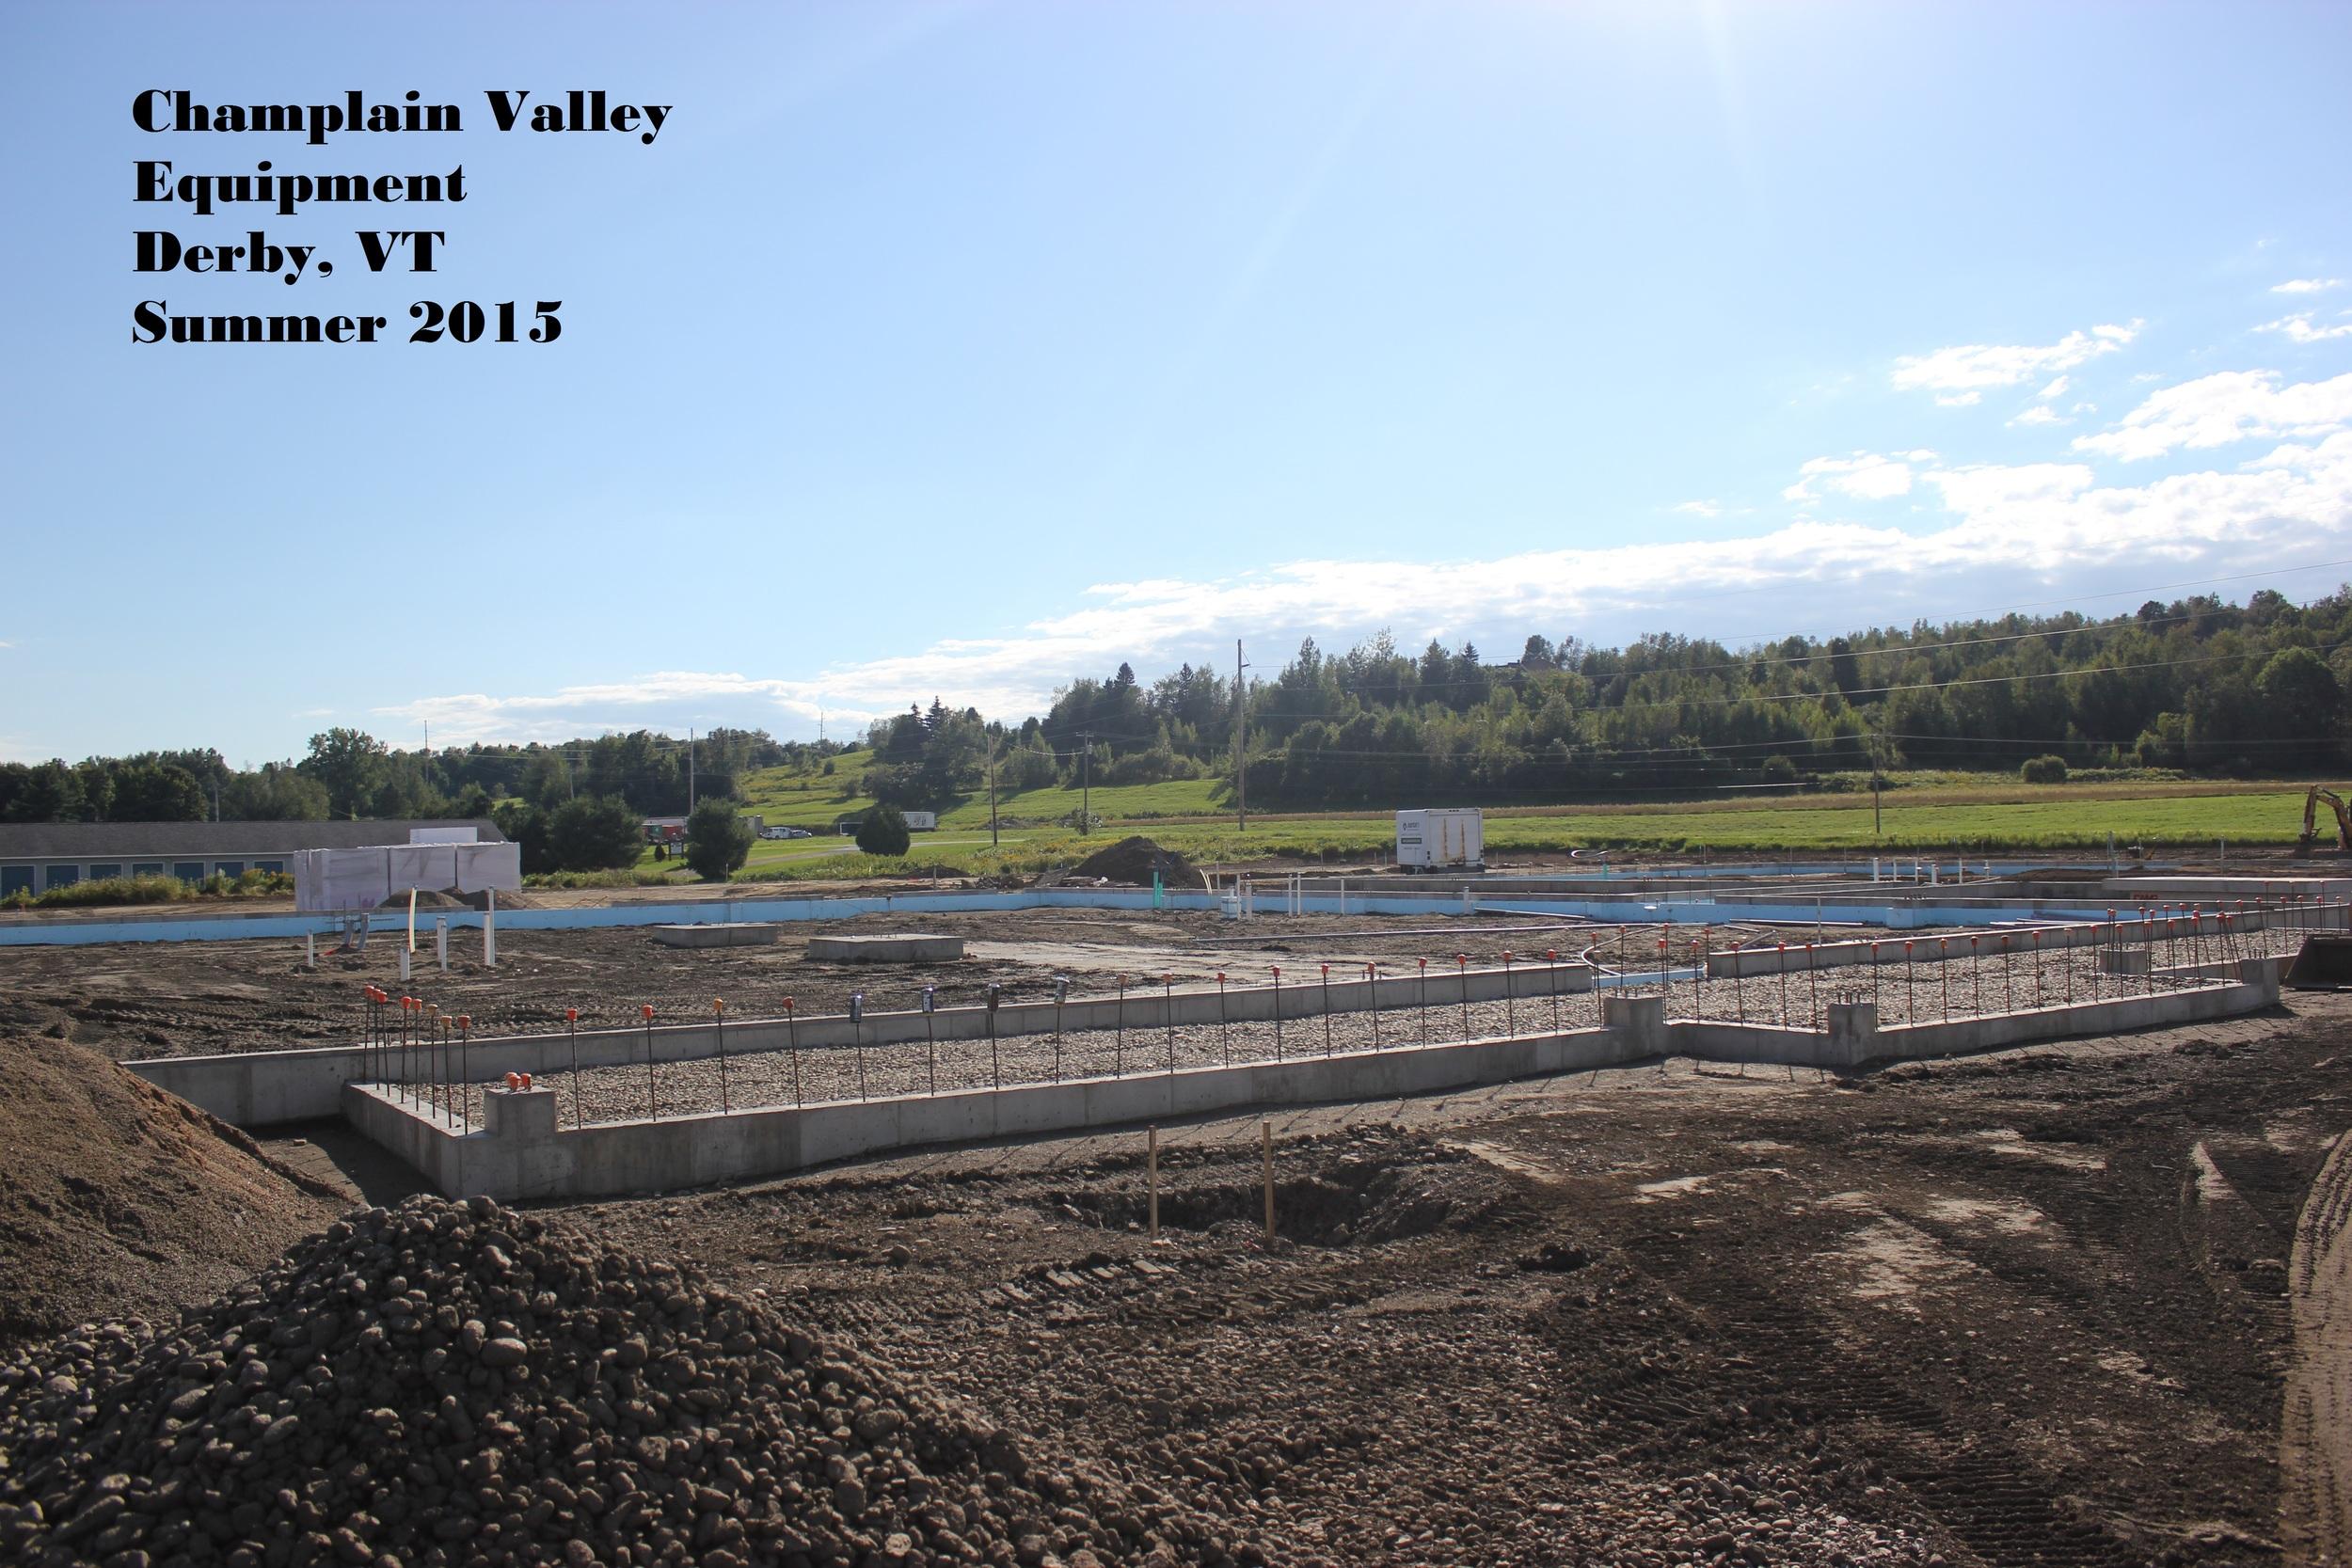 Champlain Valley Equipment August 2015 # 5.jpg